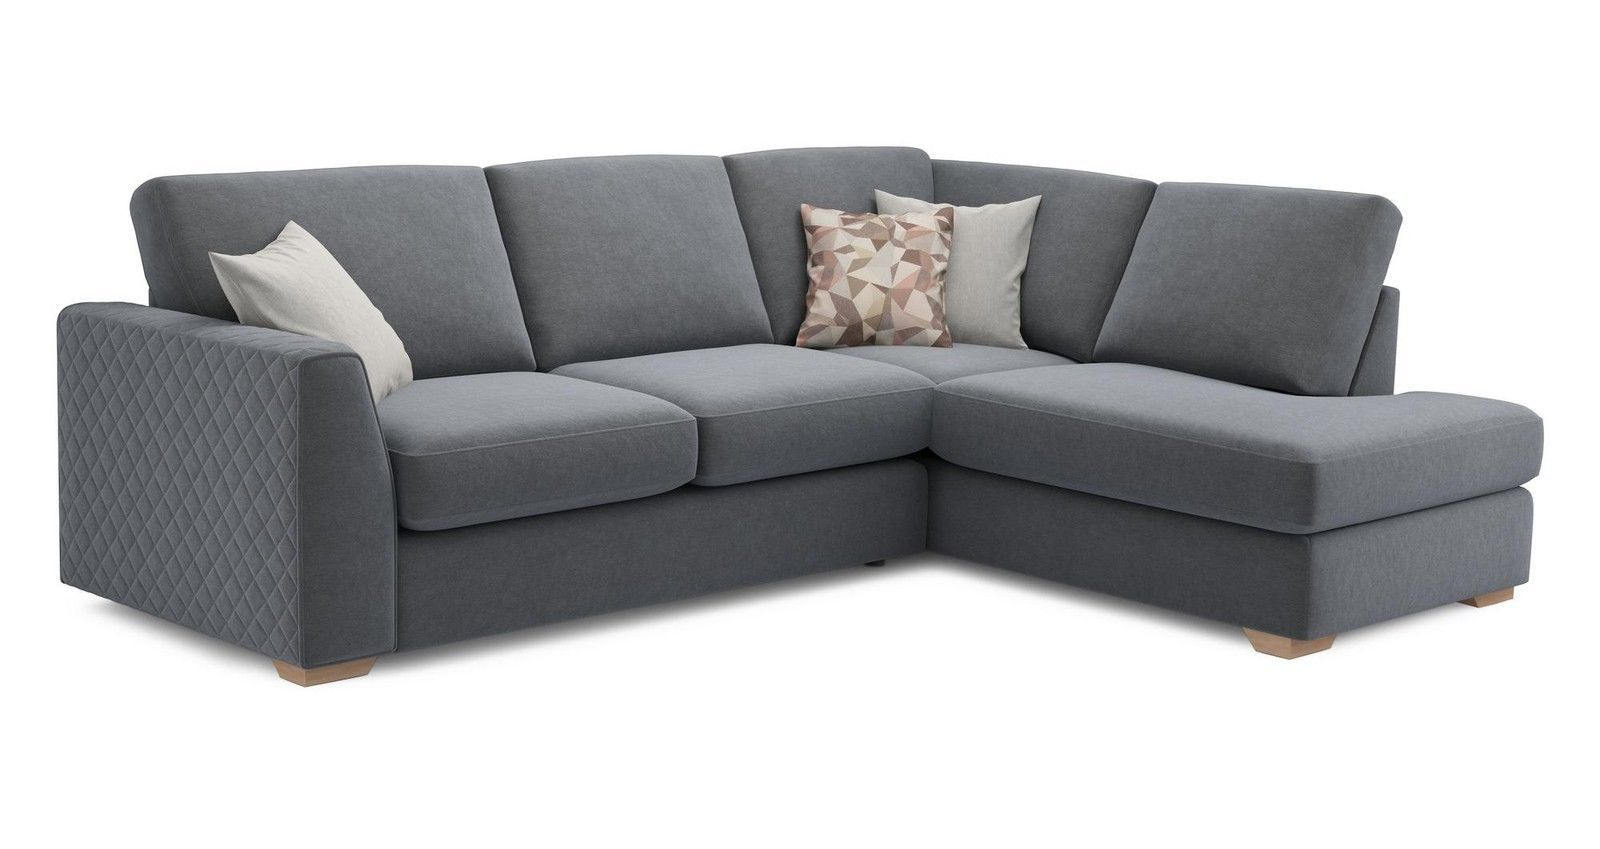 Dfs Black Corner Fabric Sofa Www Cintronbeveragegroup Com